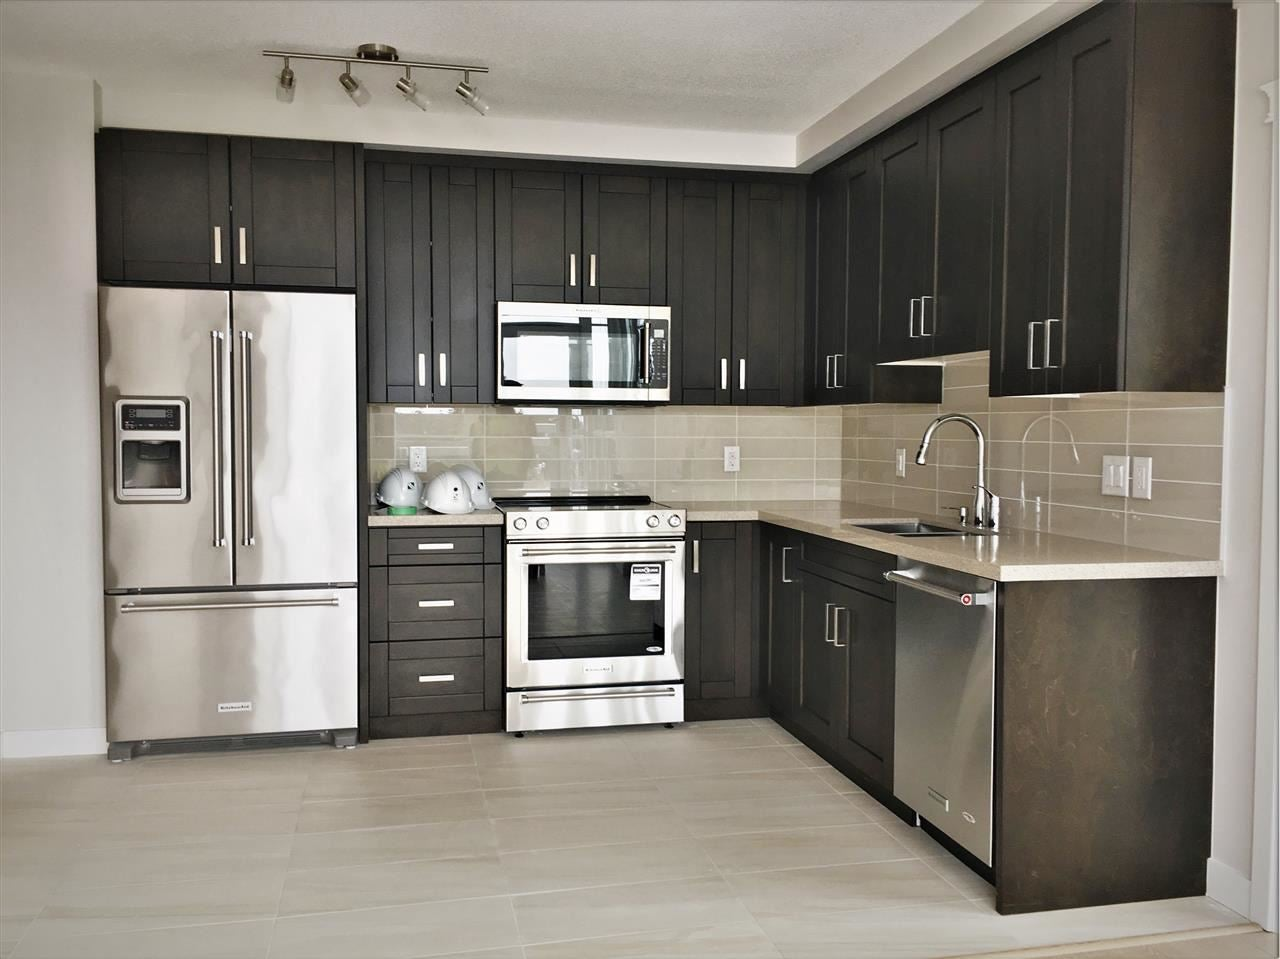 811 11967 80 AVENUE - Scottsdale Apartment/Condo for sale, 2 Bedrooms (R2555518) - #2